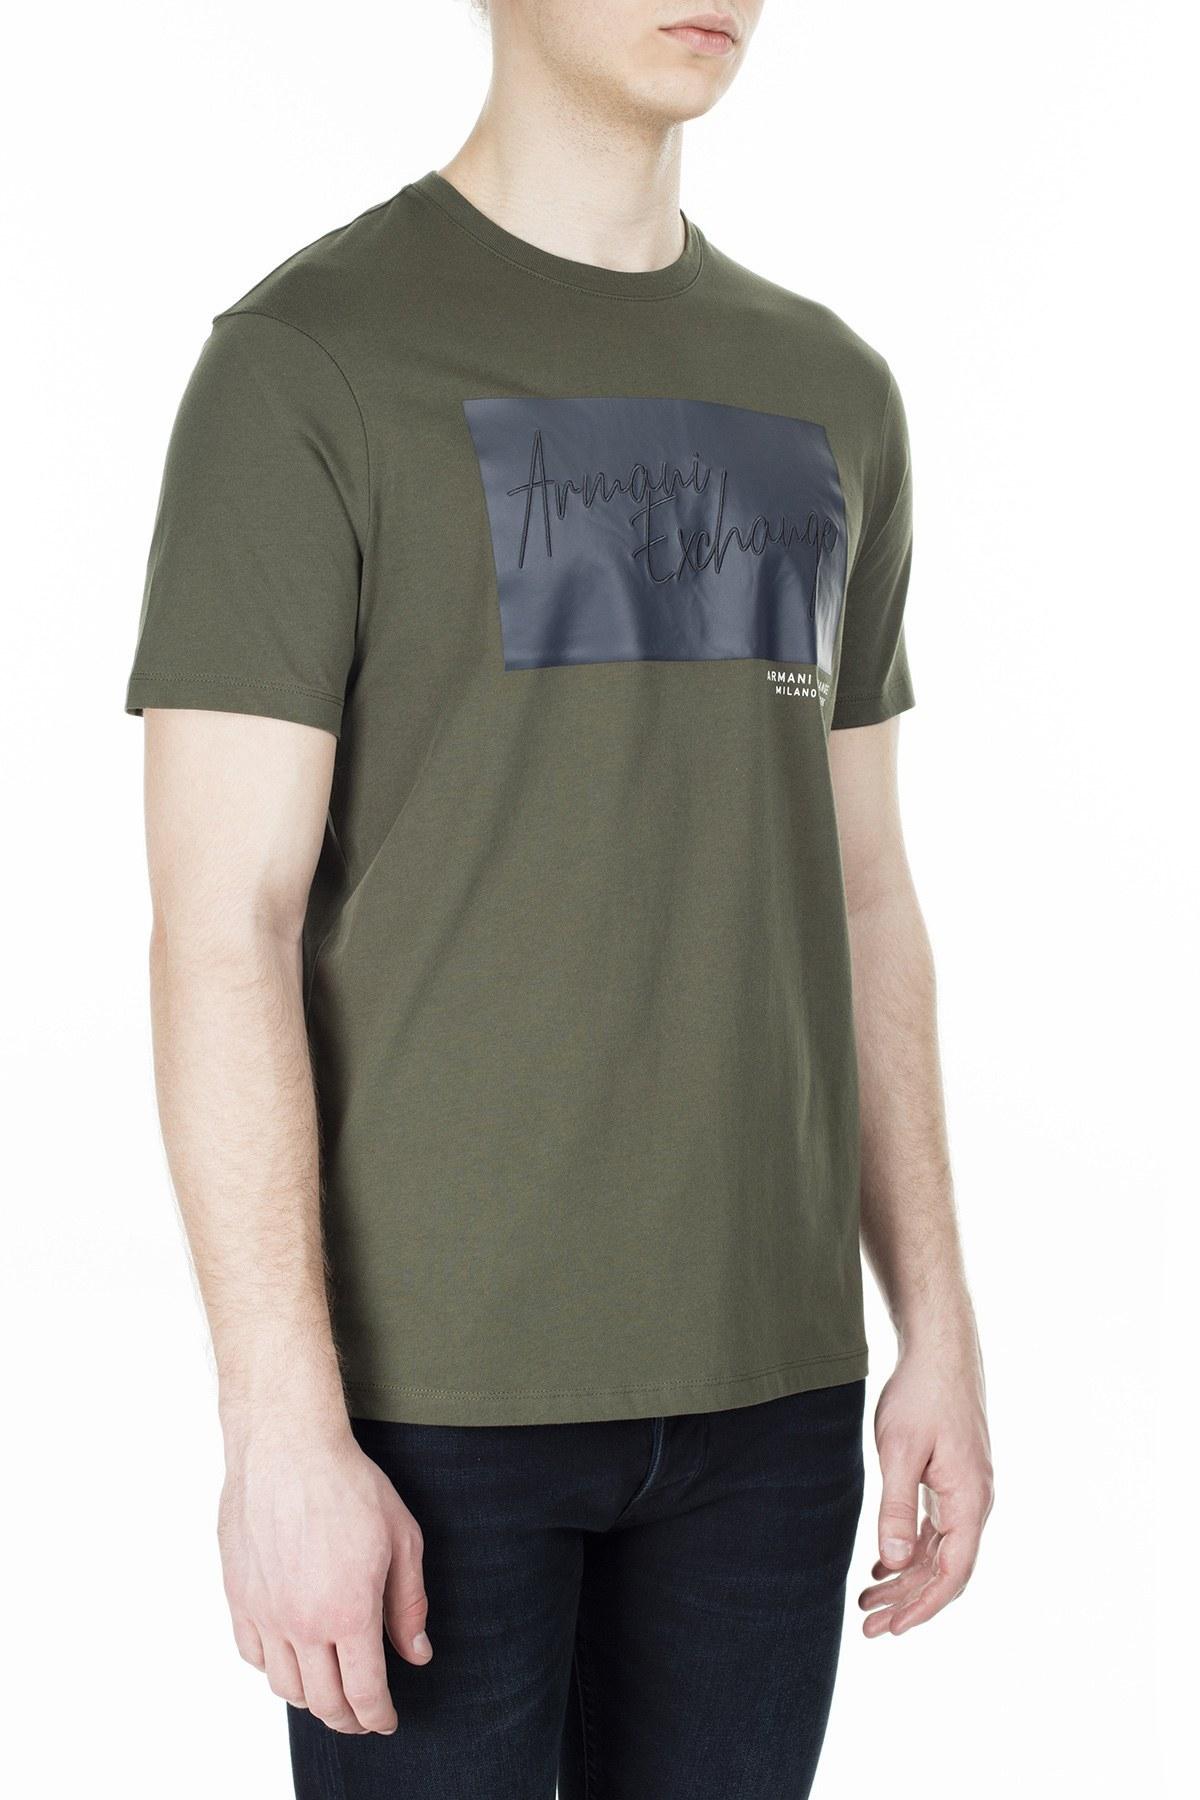 Armani Exchange Erkek T Shirt S 6GZTBP ZJBVZ 1842 HAKİ